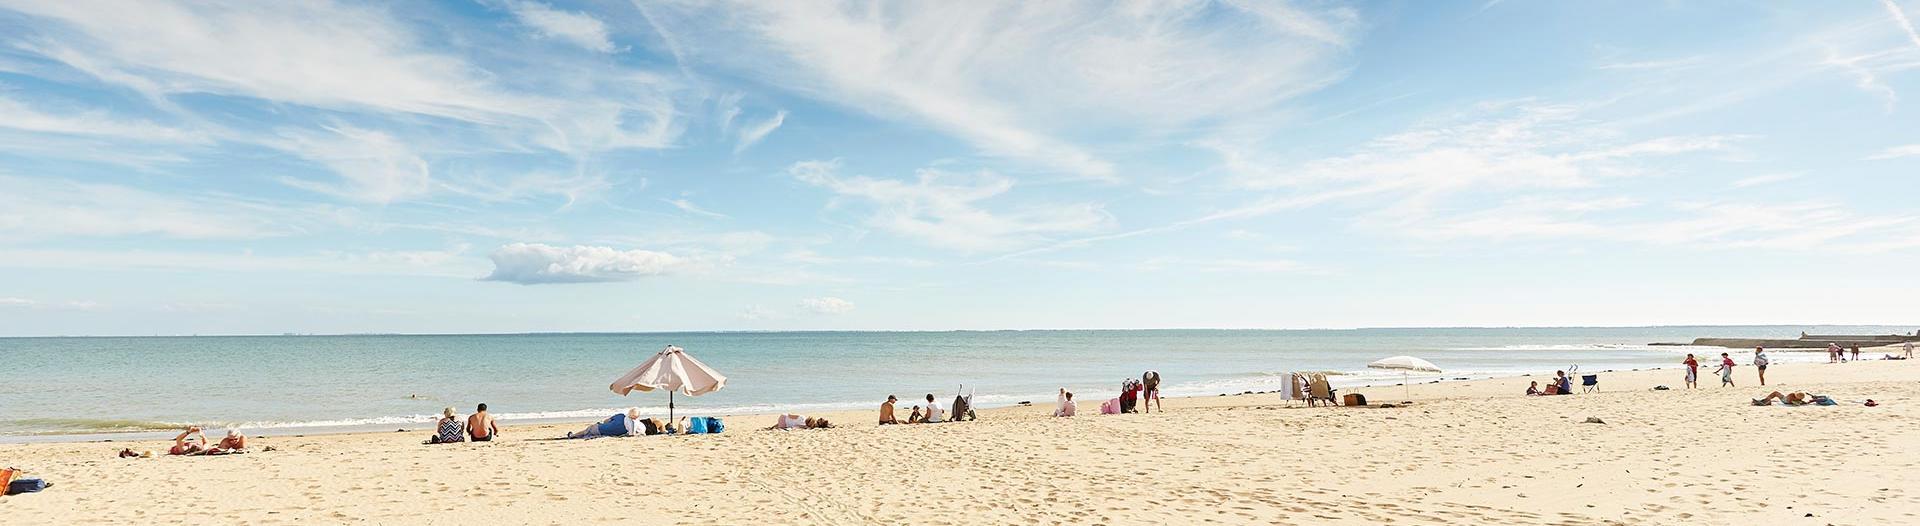 slider-cote-atlantique-plage-vendee